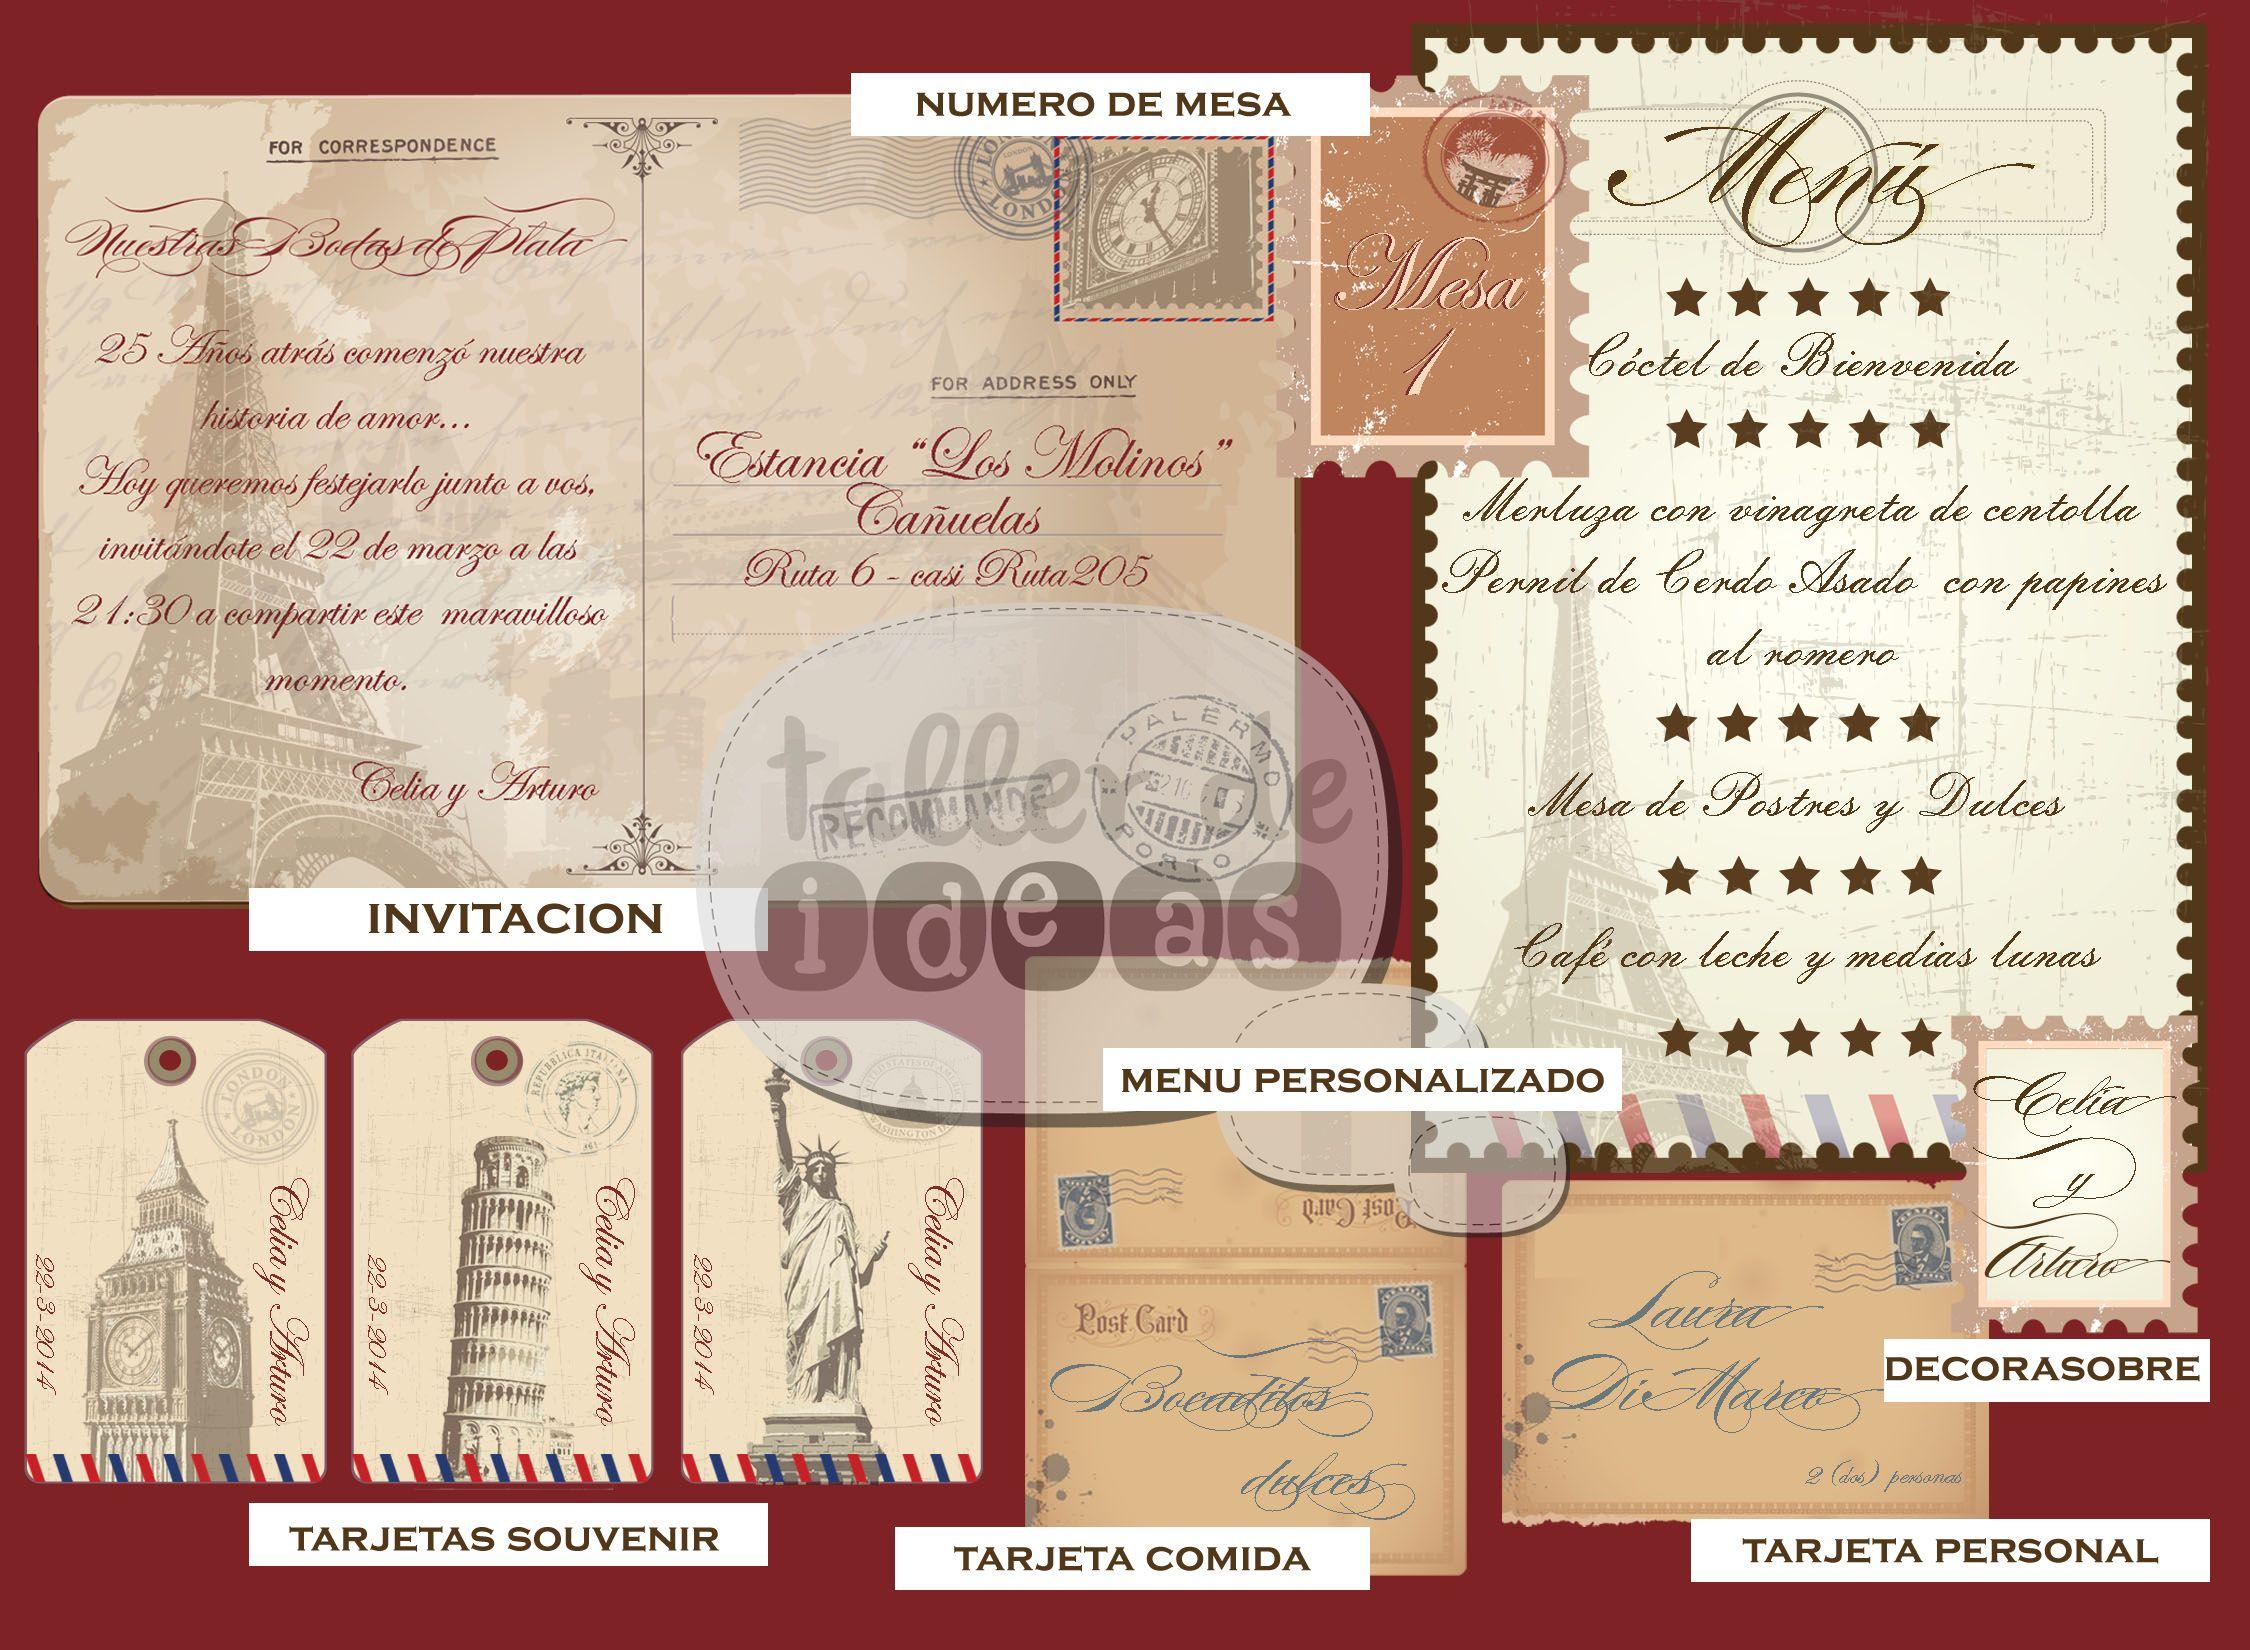 Tarjetas De Aniversario De Bodas: Aniversario Bodas De Plata : Invitación